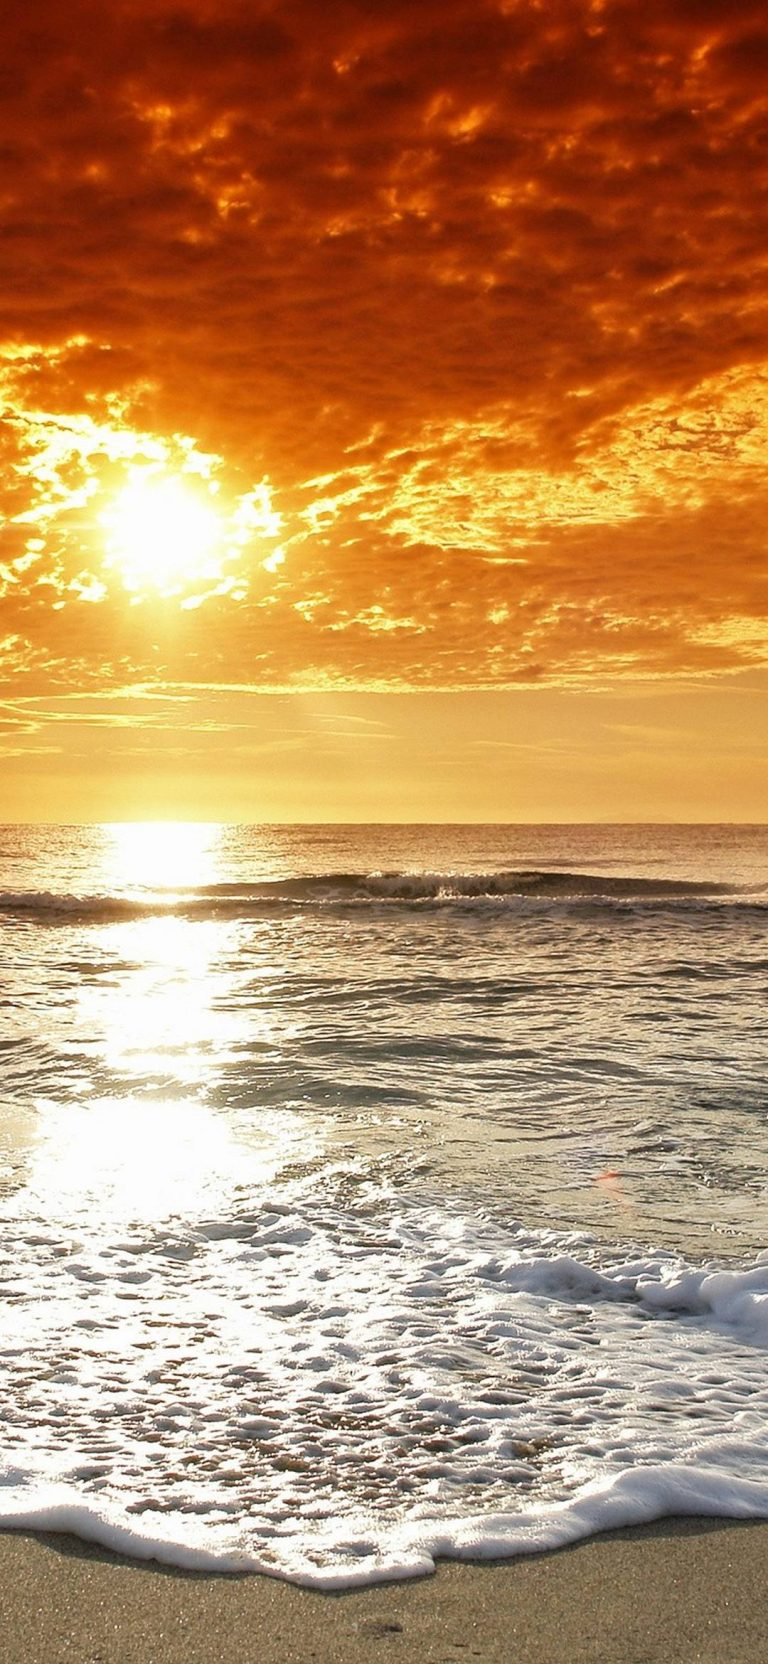 Water Clouds Sun Beach Sand 1080x2340 768x1664